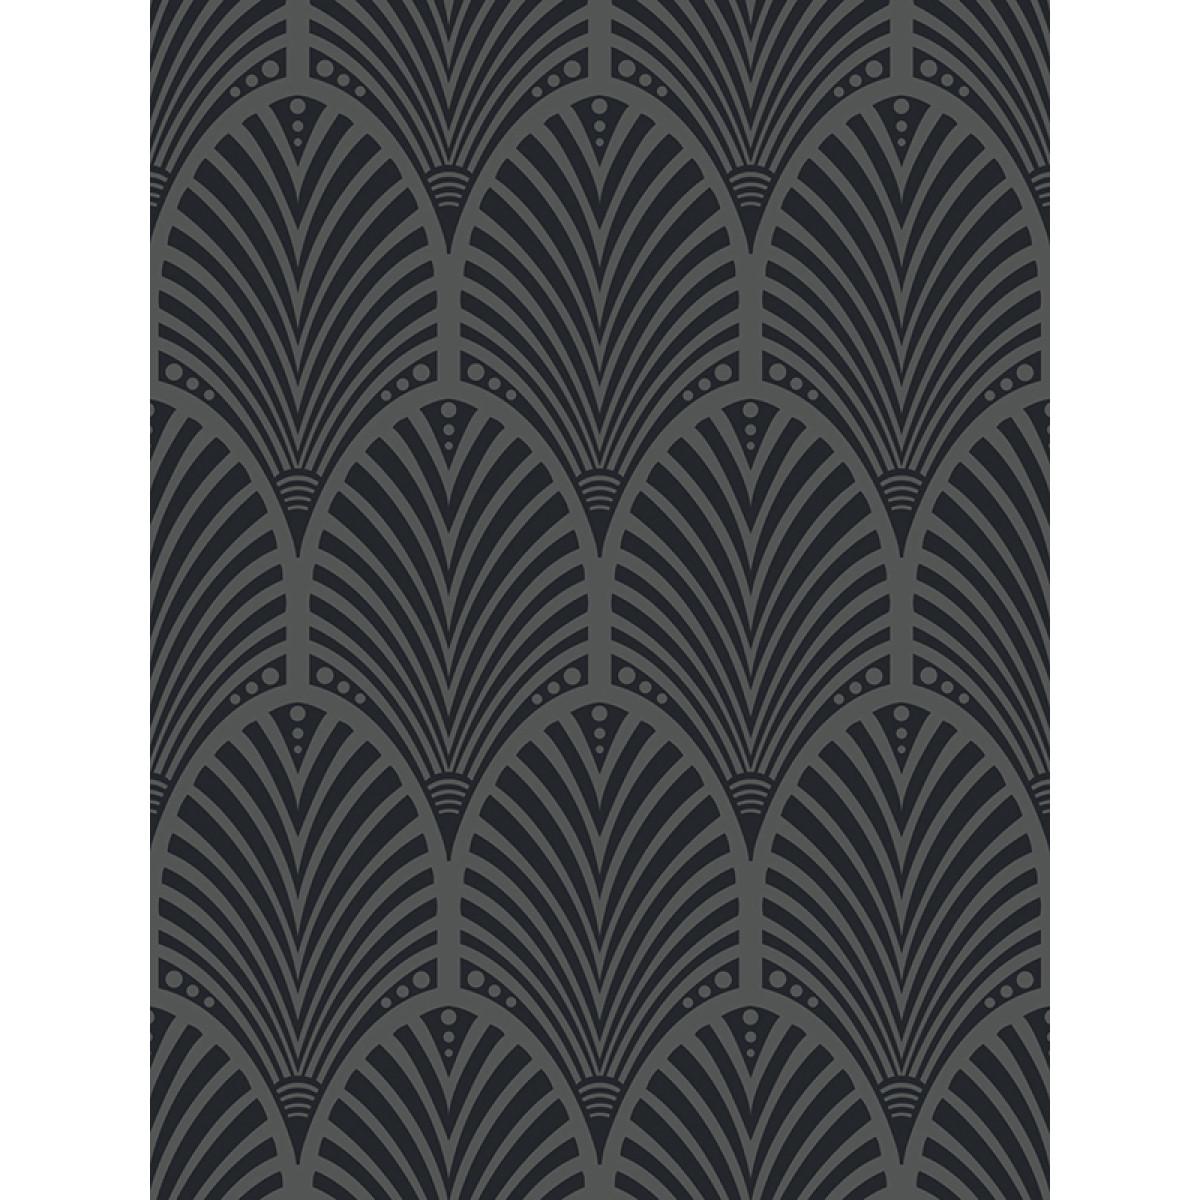 Gatsby Art Deco Wallpaper Charcoal Holden Decor 65250